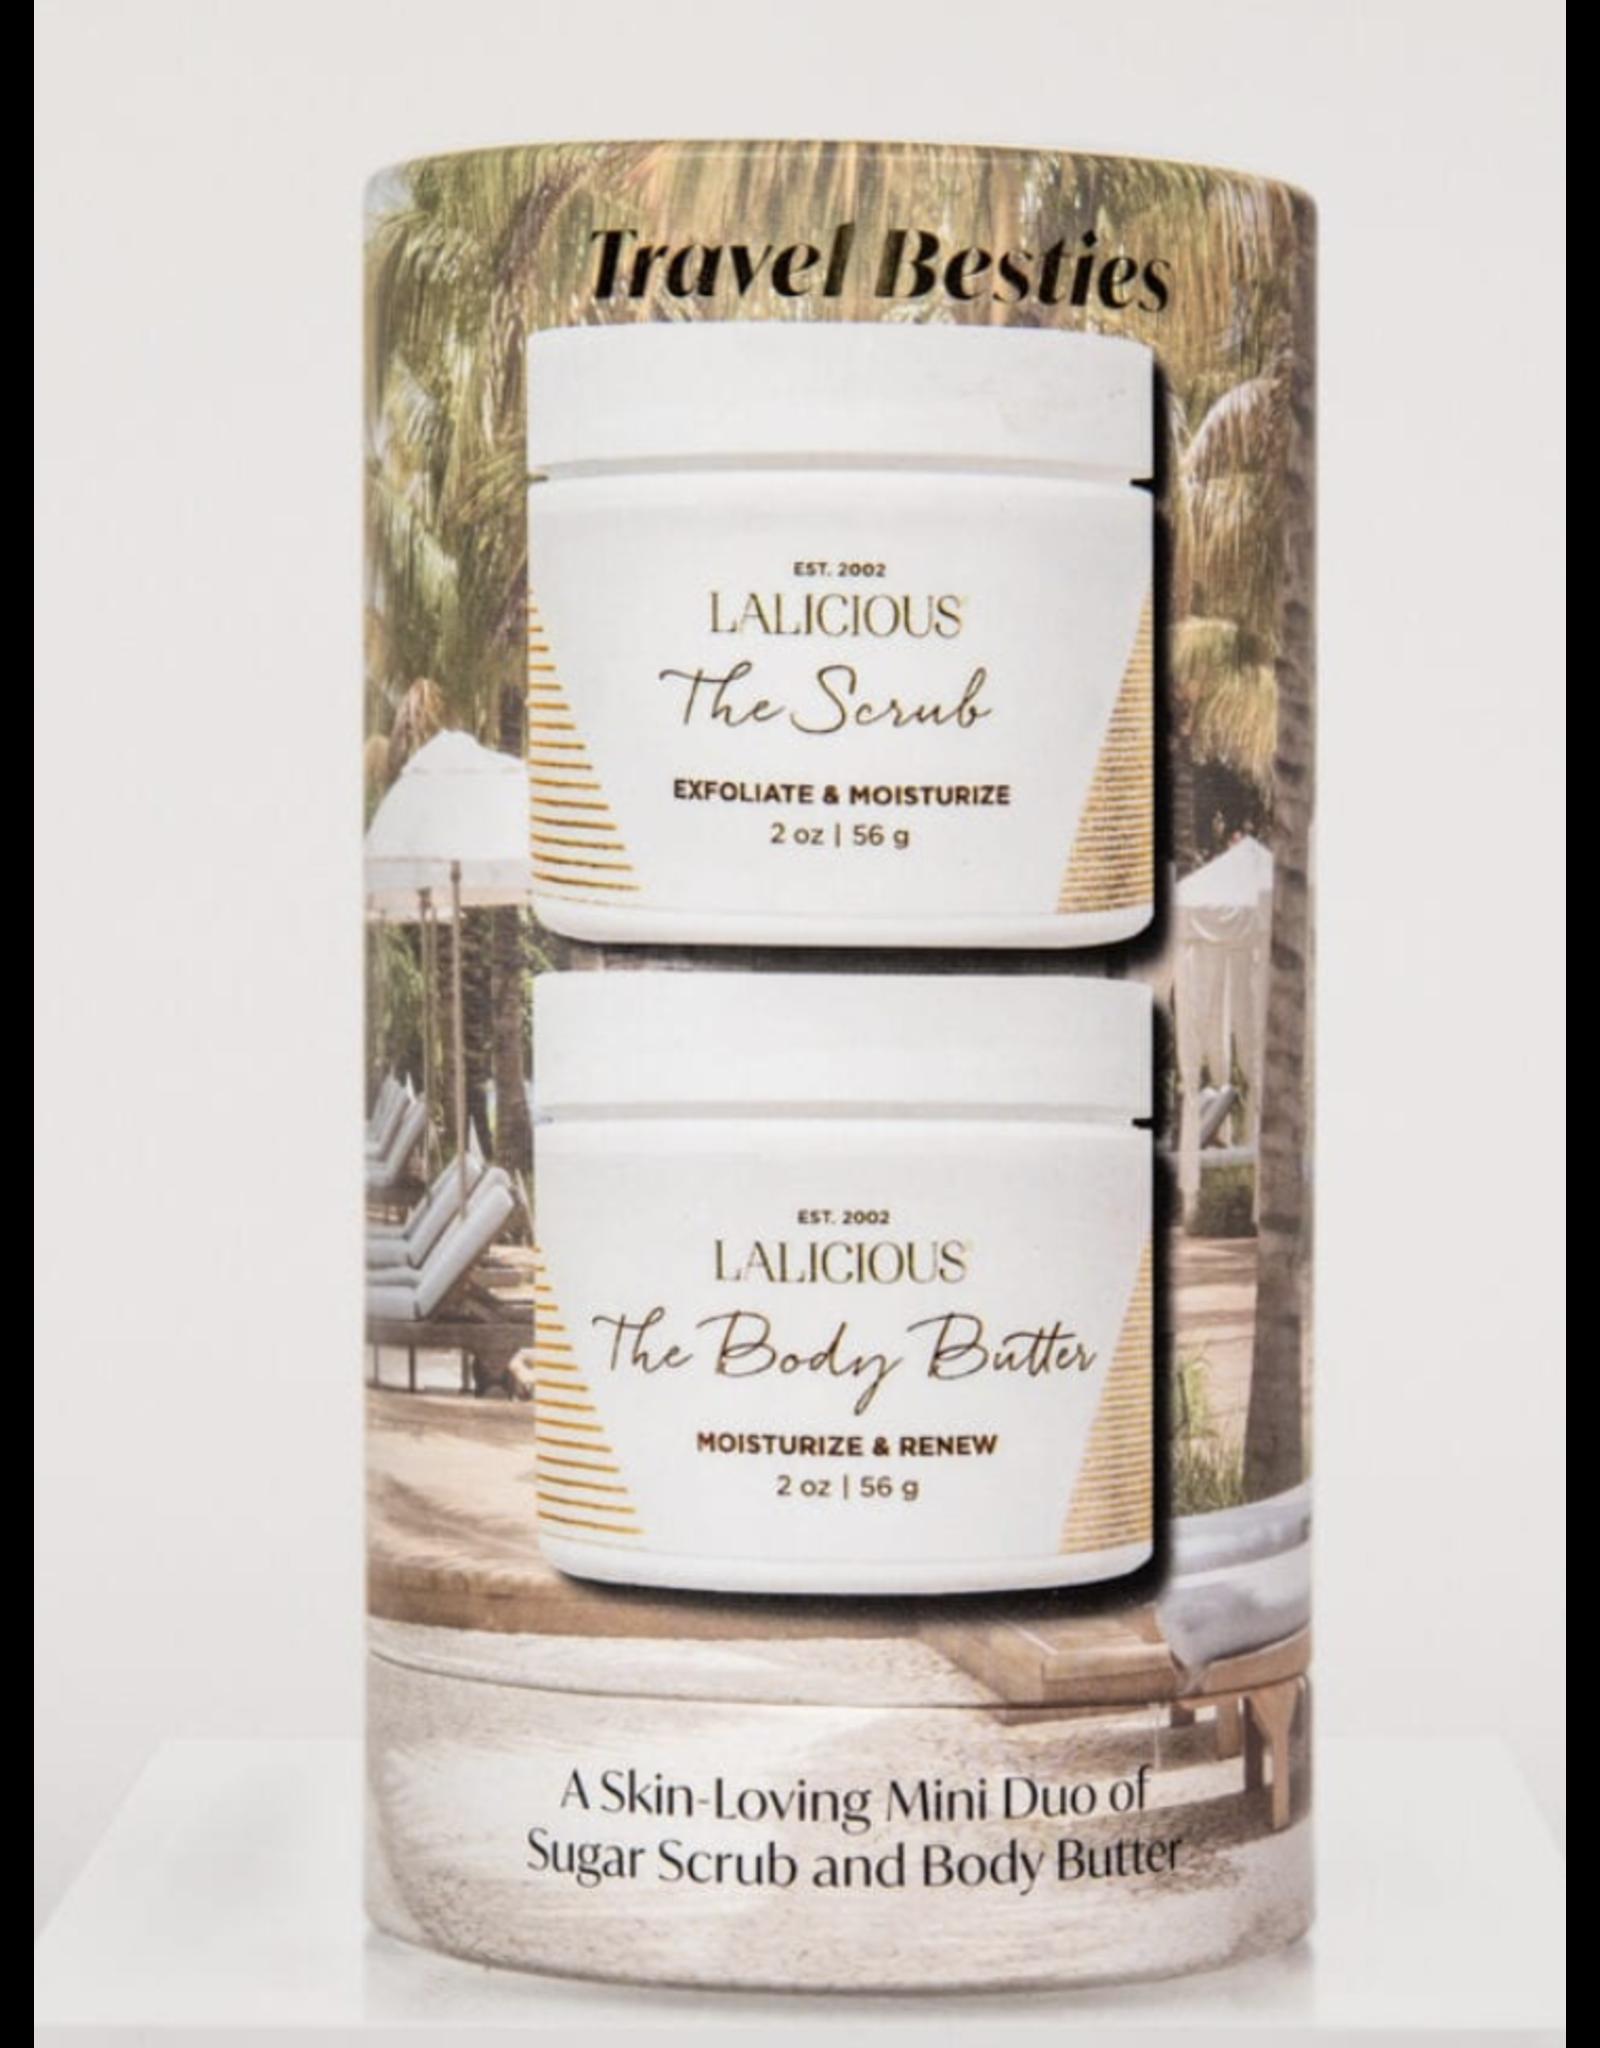 lalicious Travel Besties